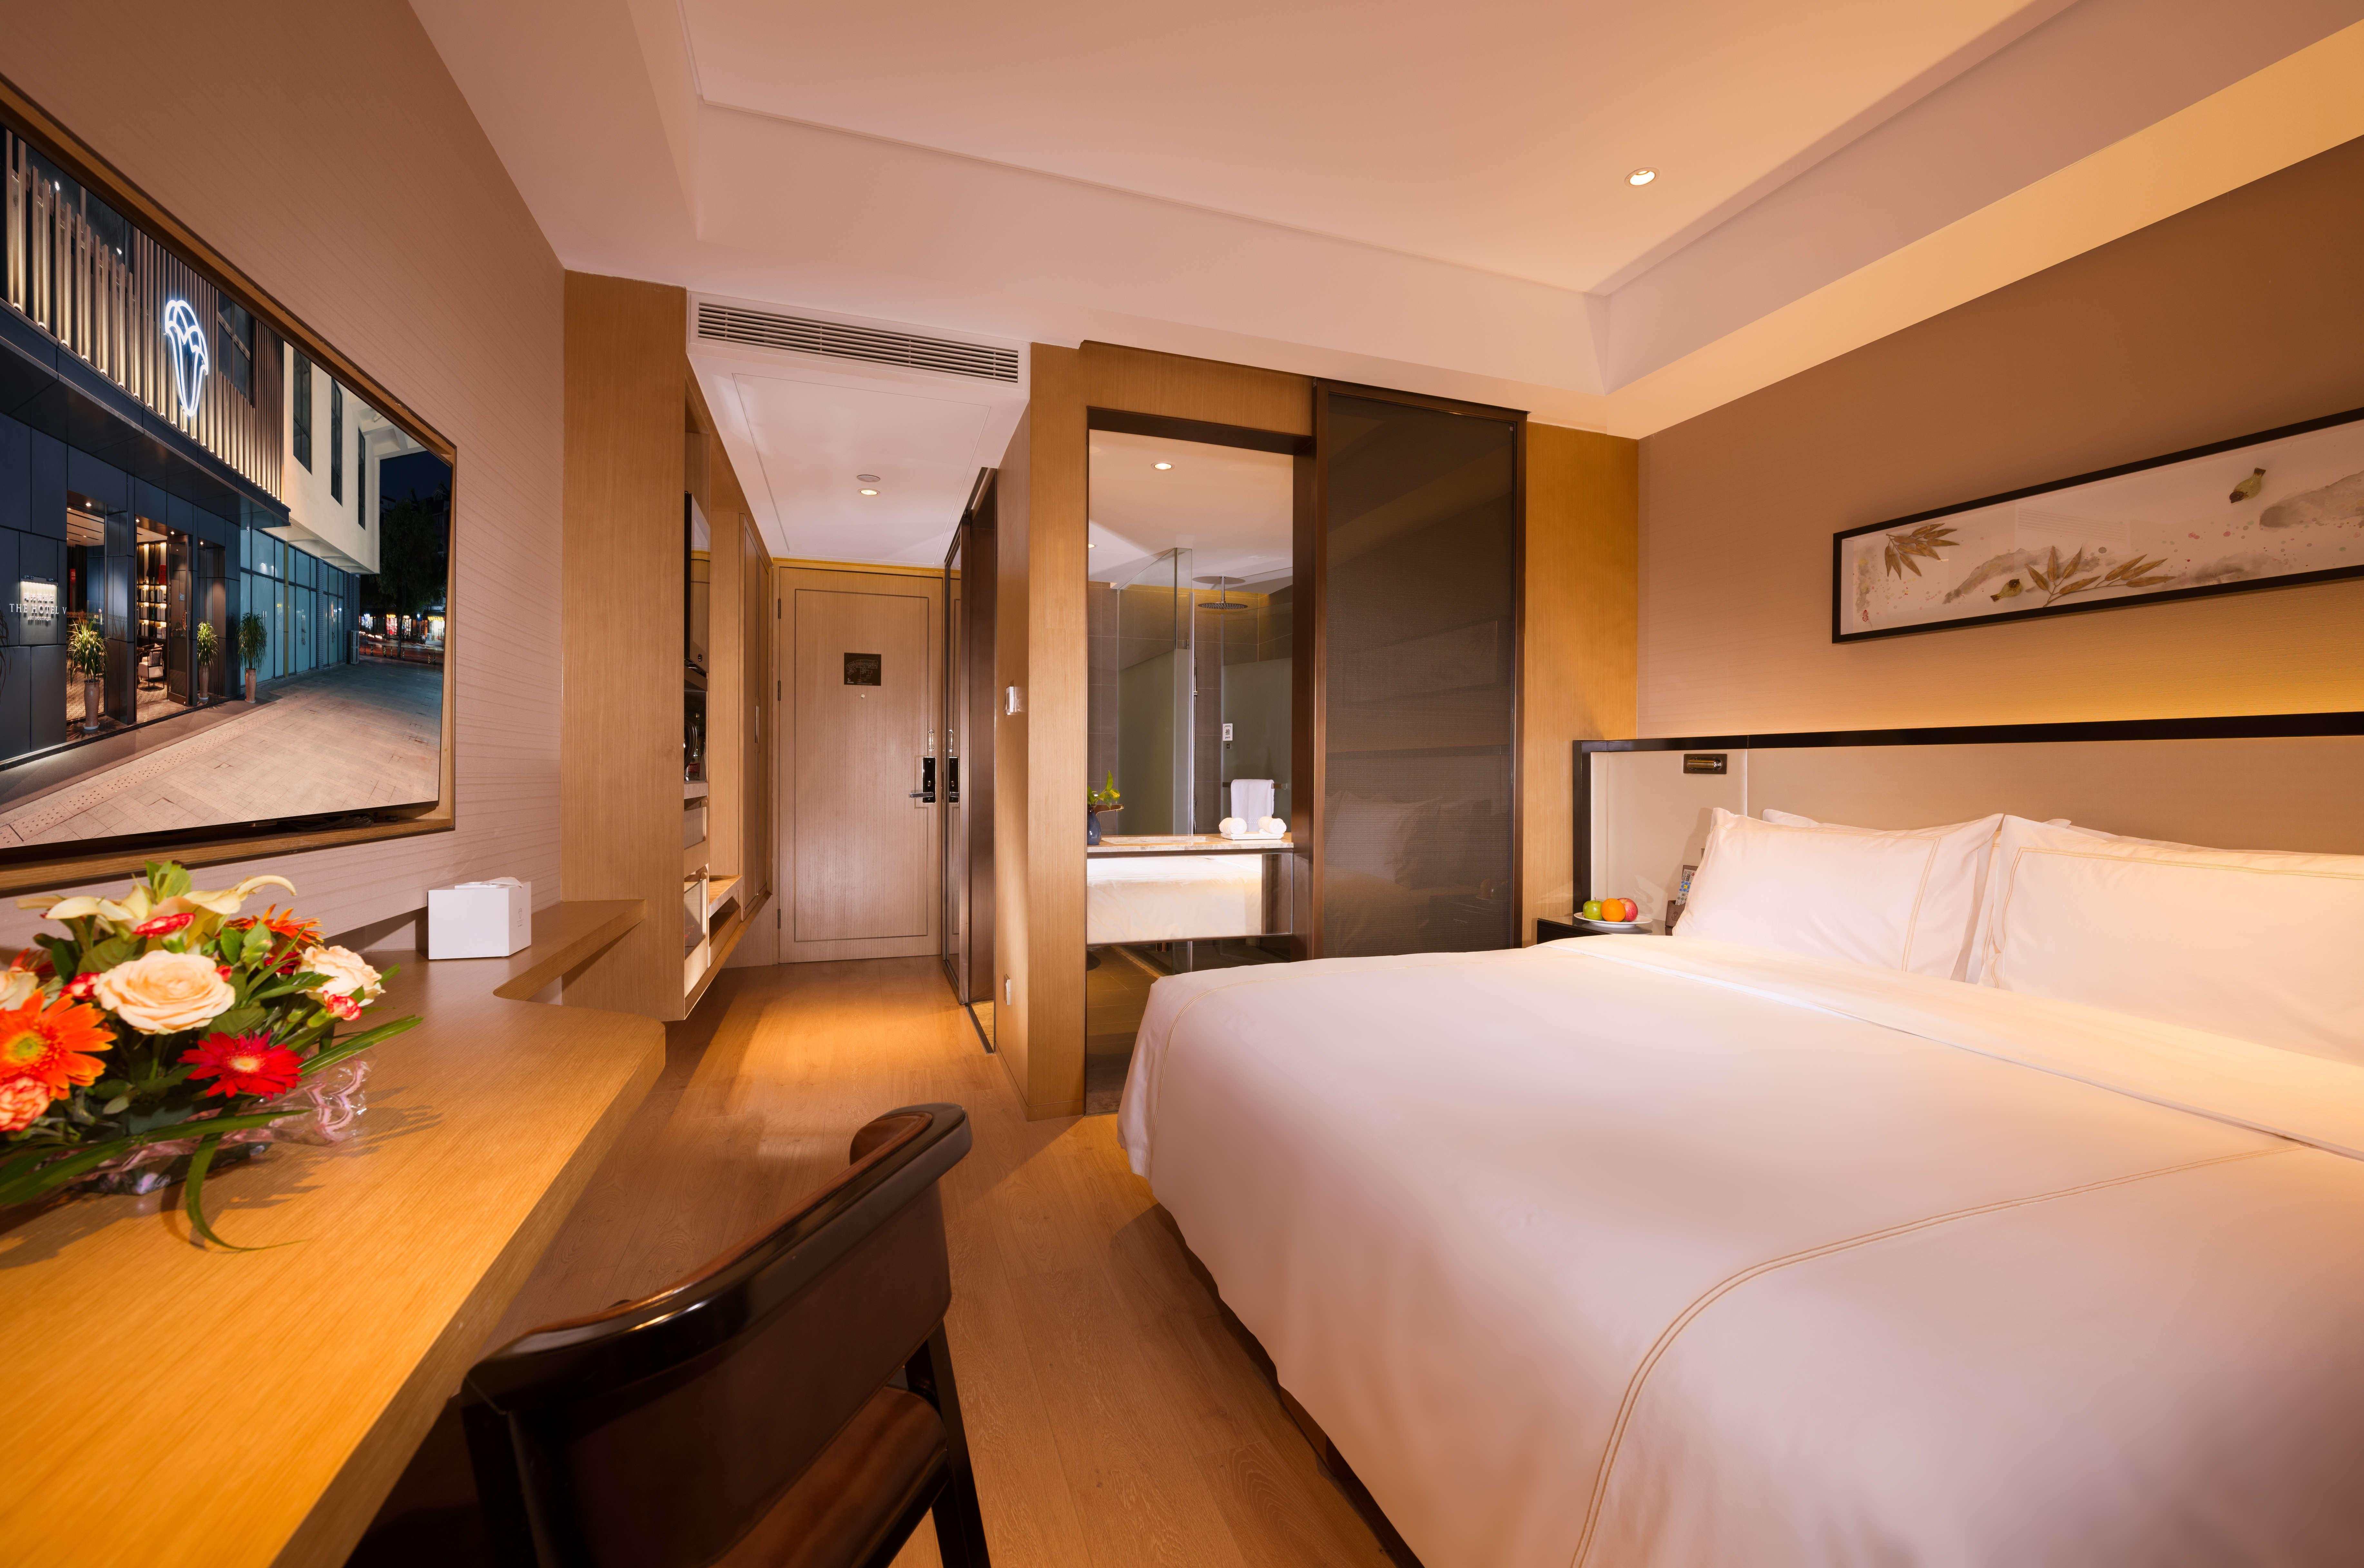 Nanjing shuguangwei Hotel (Confucius Temple store) business big bed room